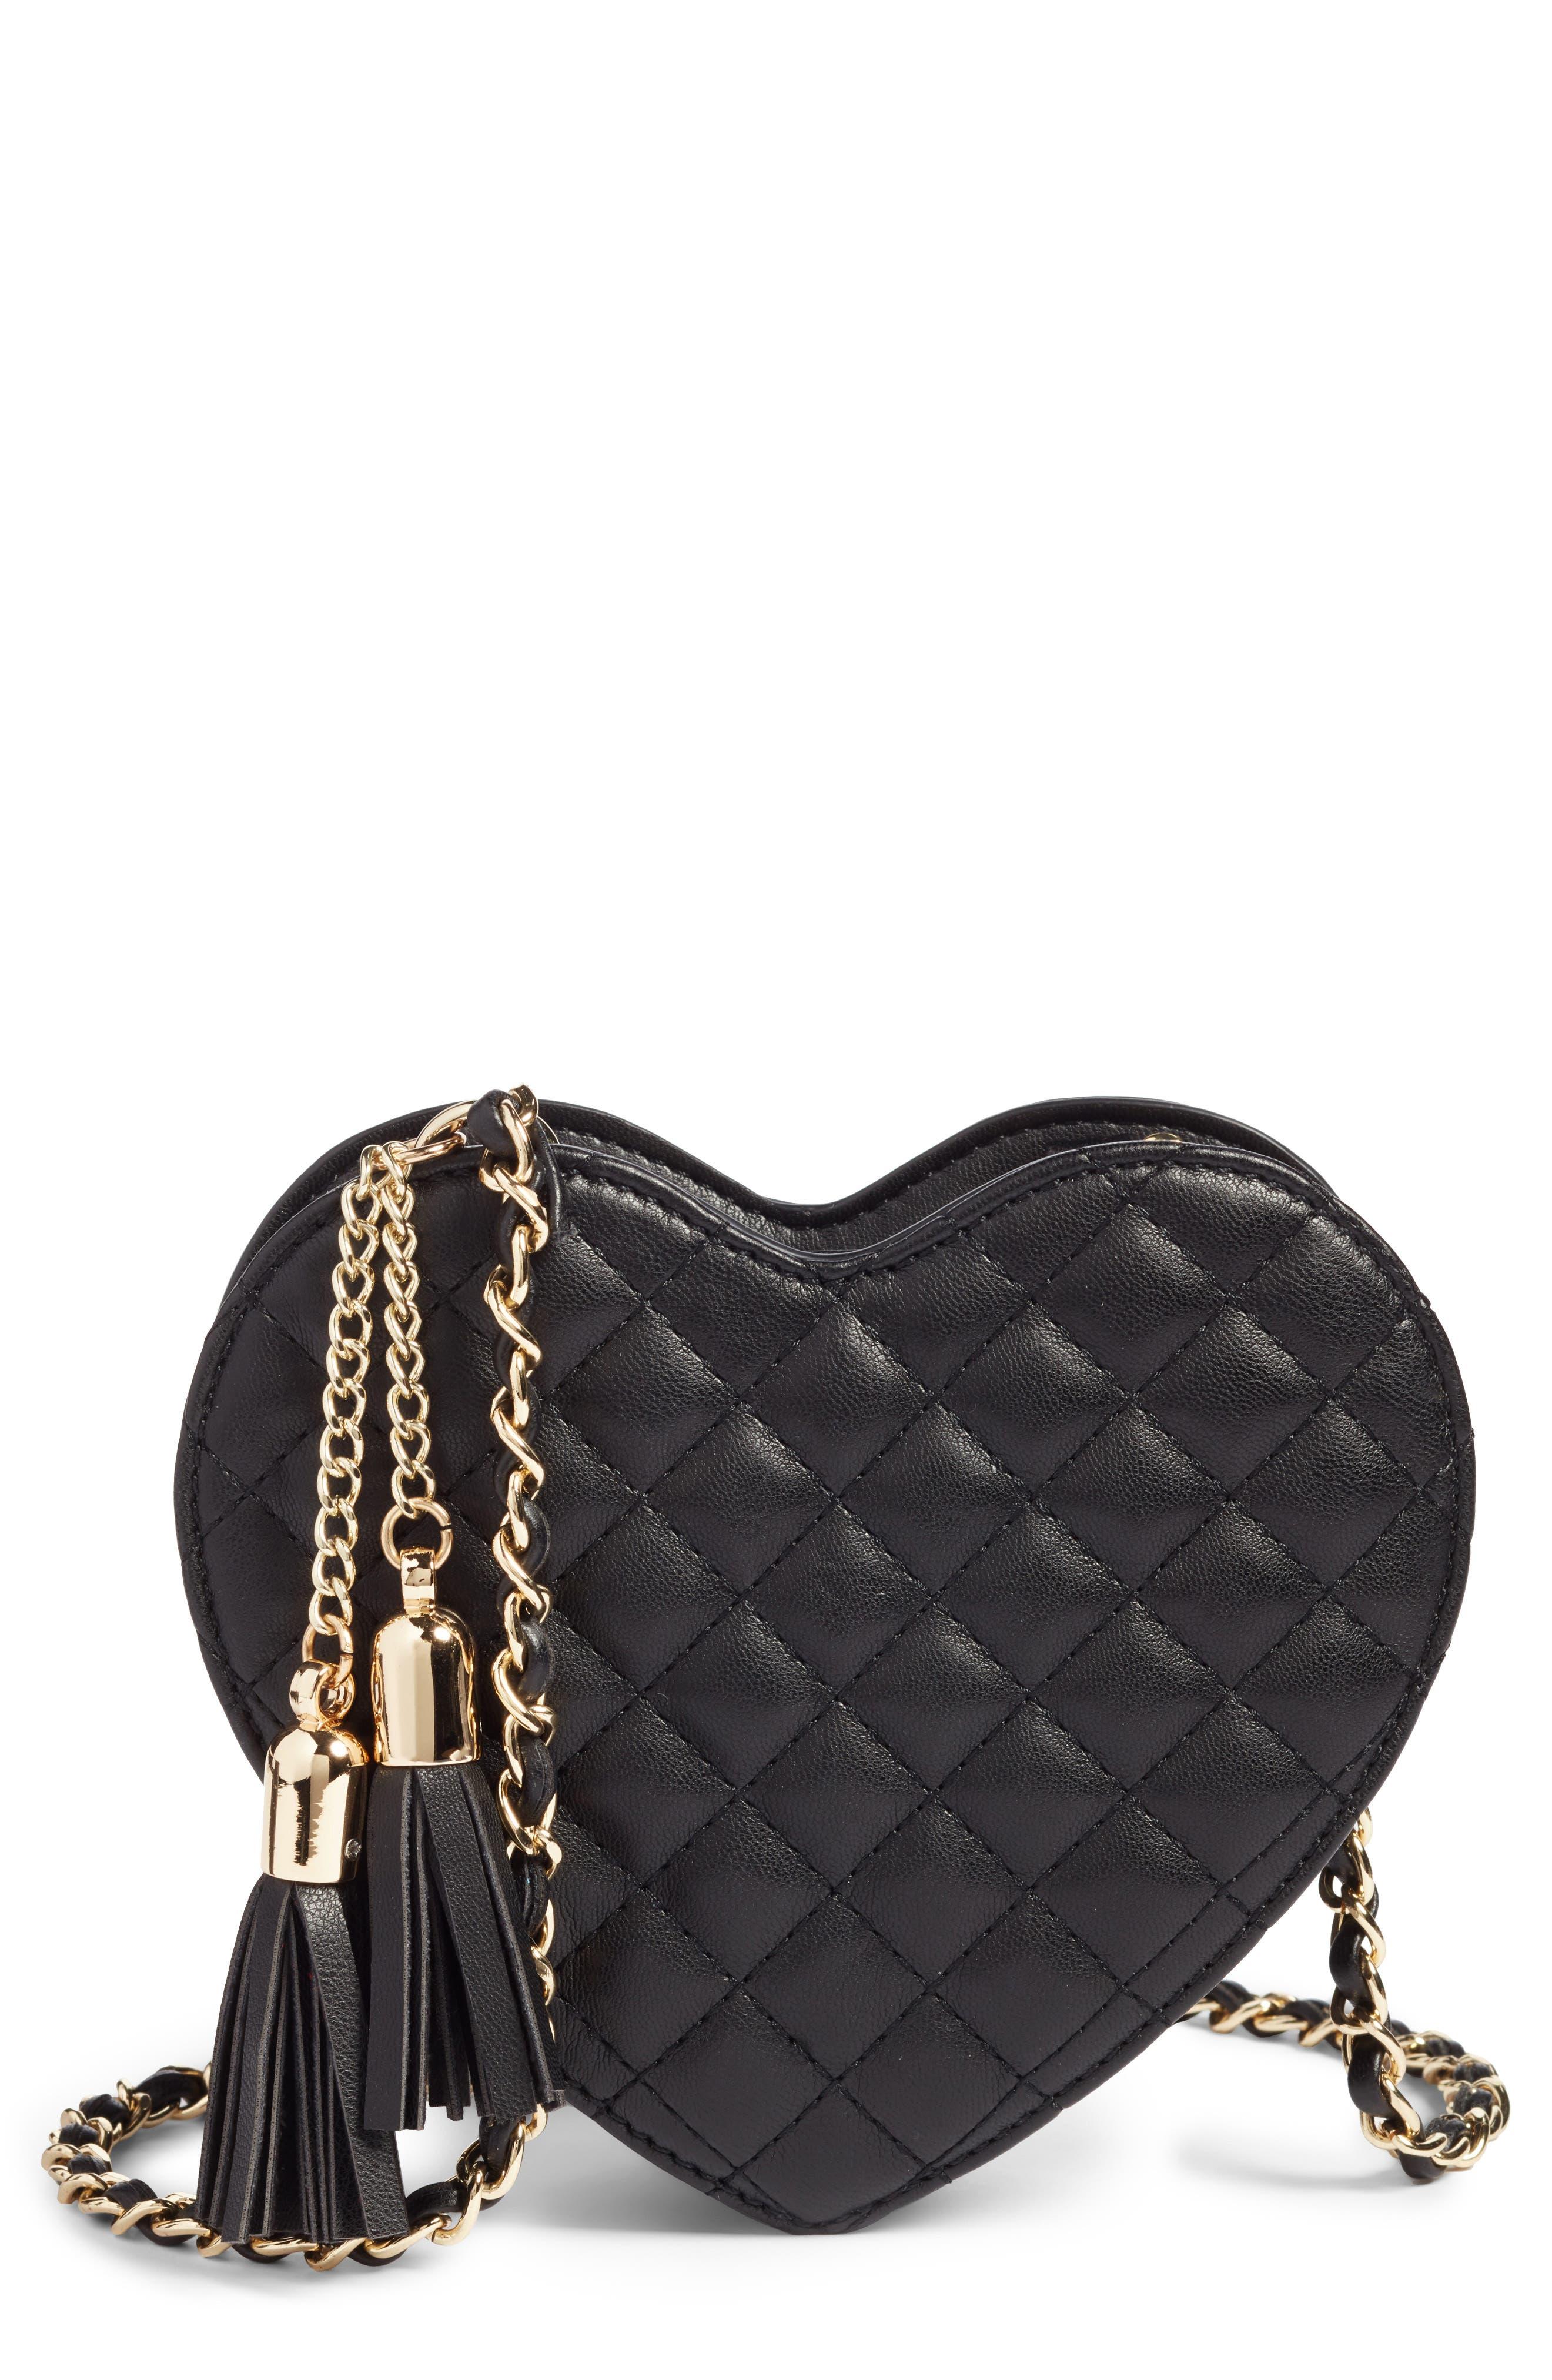 Mali + Lili Quilted Heart Vegan Leather Crossbody Bag,                             Main thumbnail 1, color,                             Black